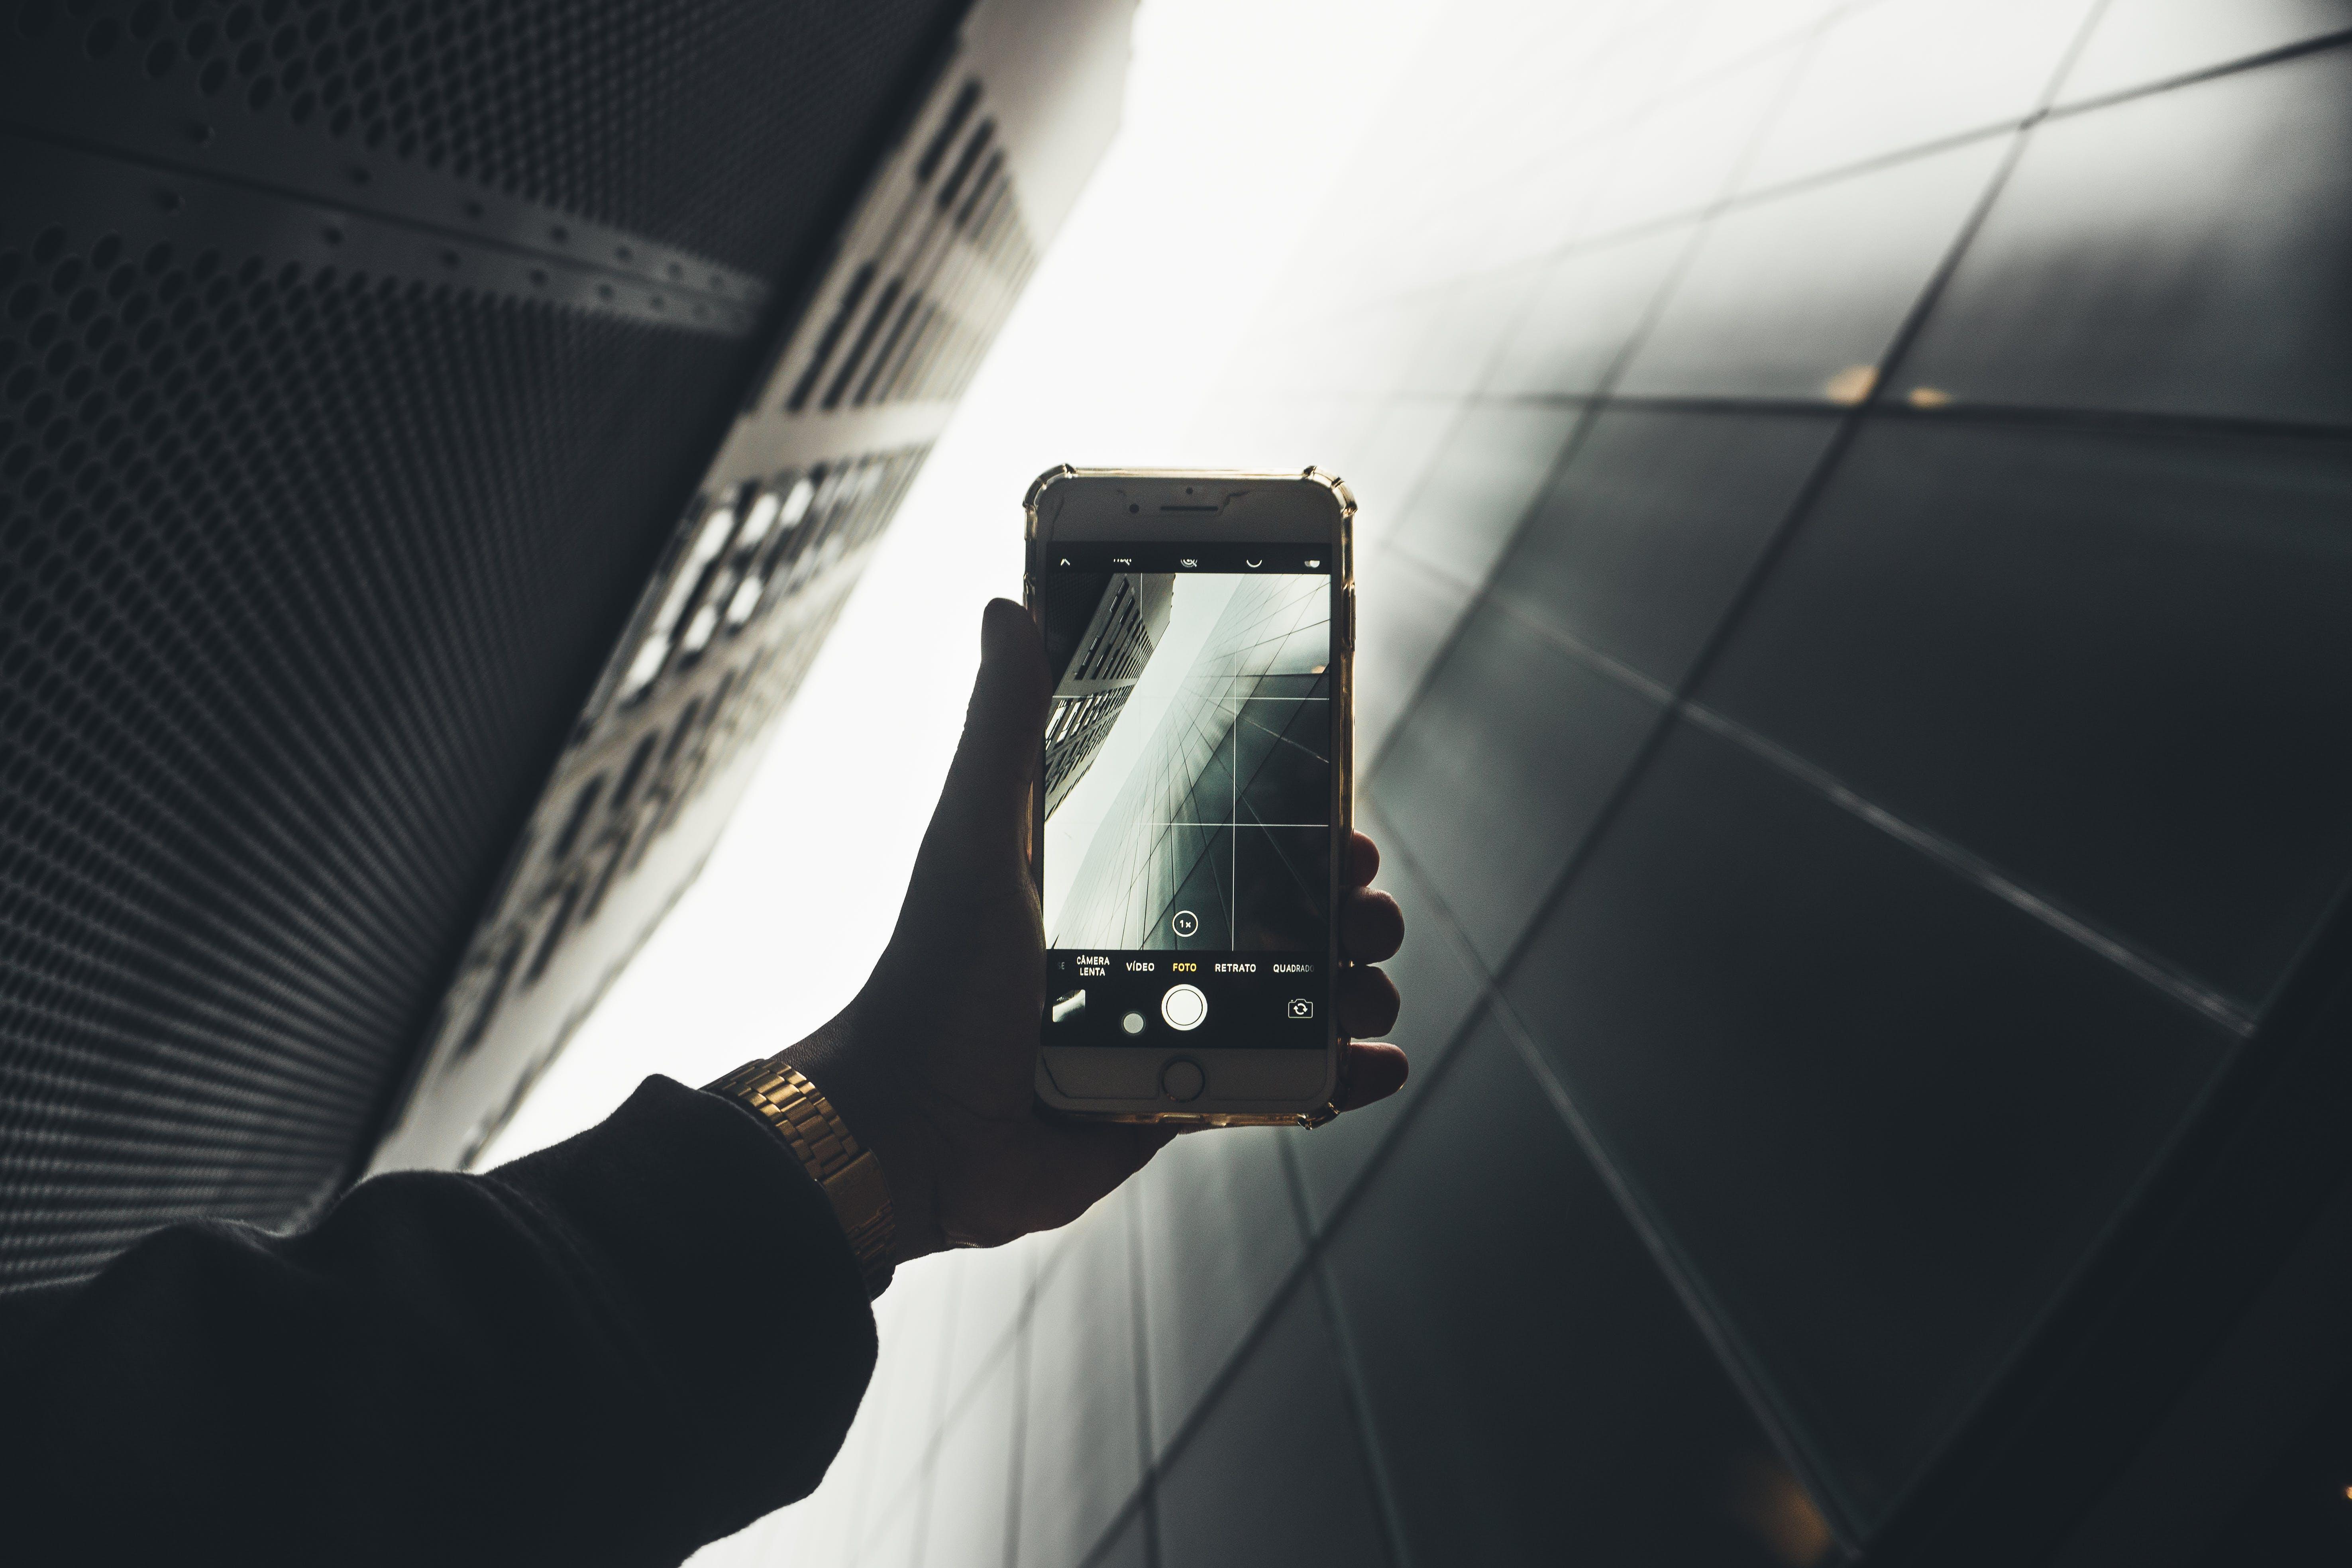 apple device, blur, camera